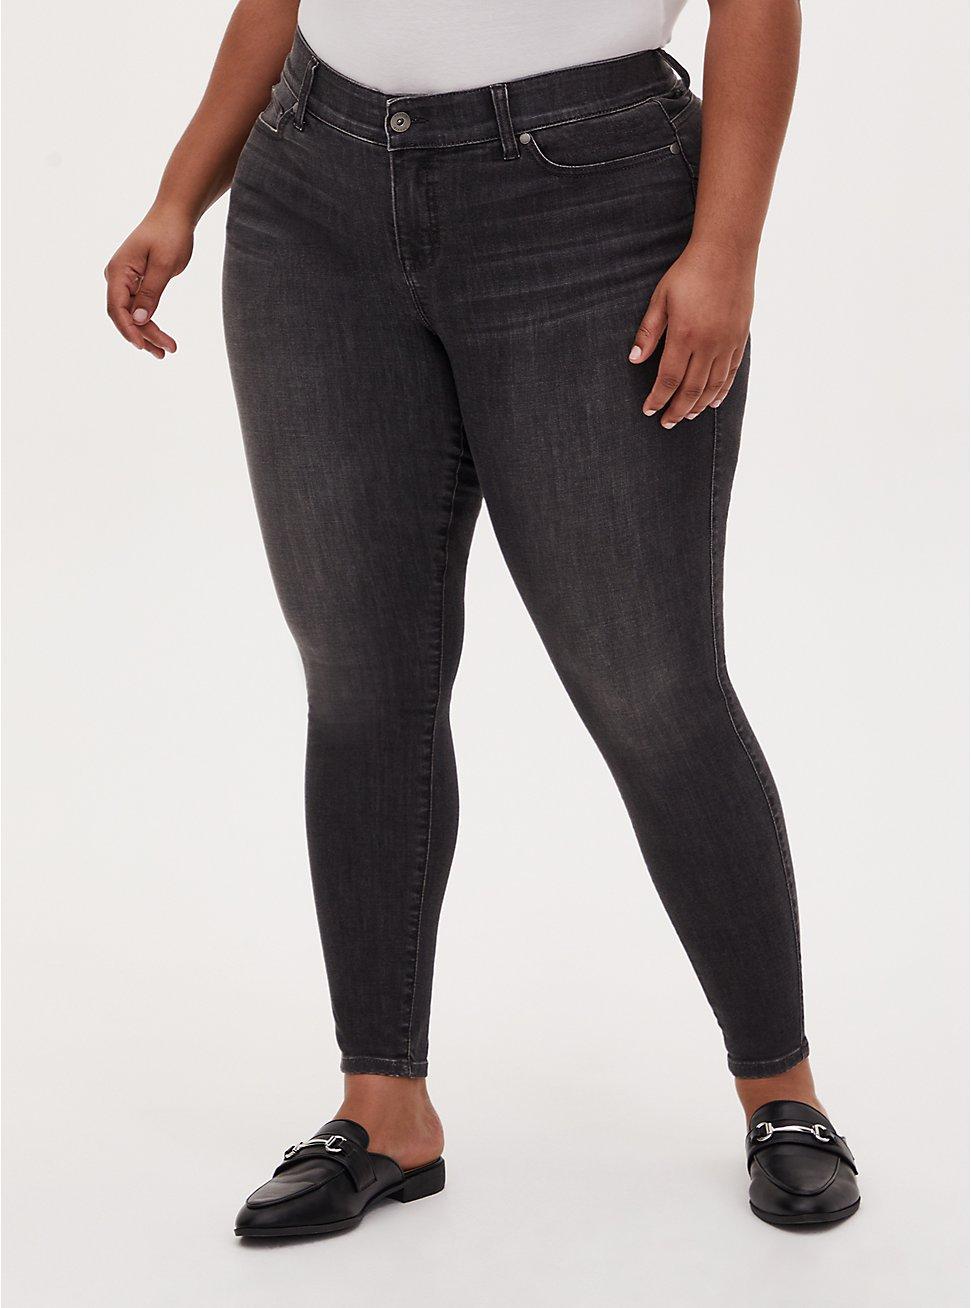 Plus Size Bombshell Skinny Jean - Super Soft Dark Grey Wash , IN SPADES, hi-res